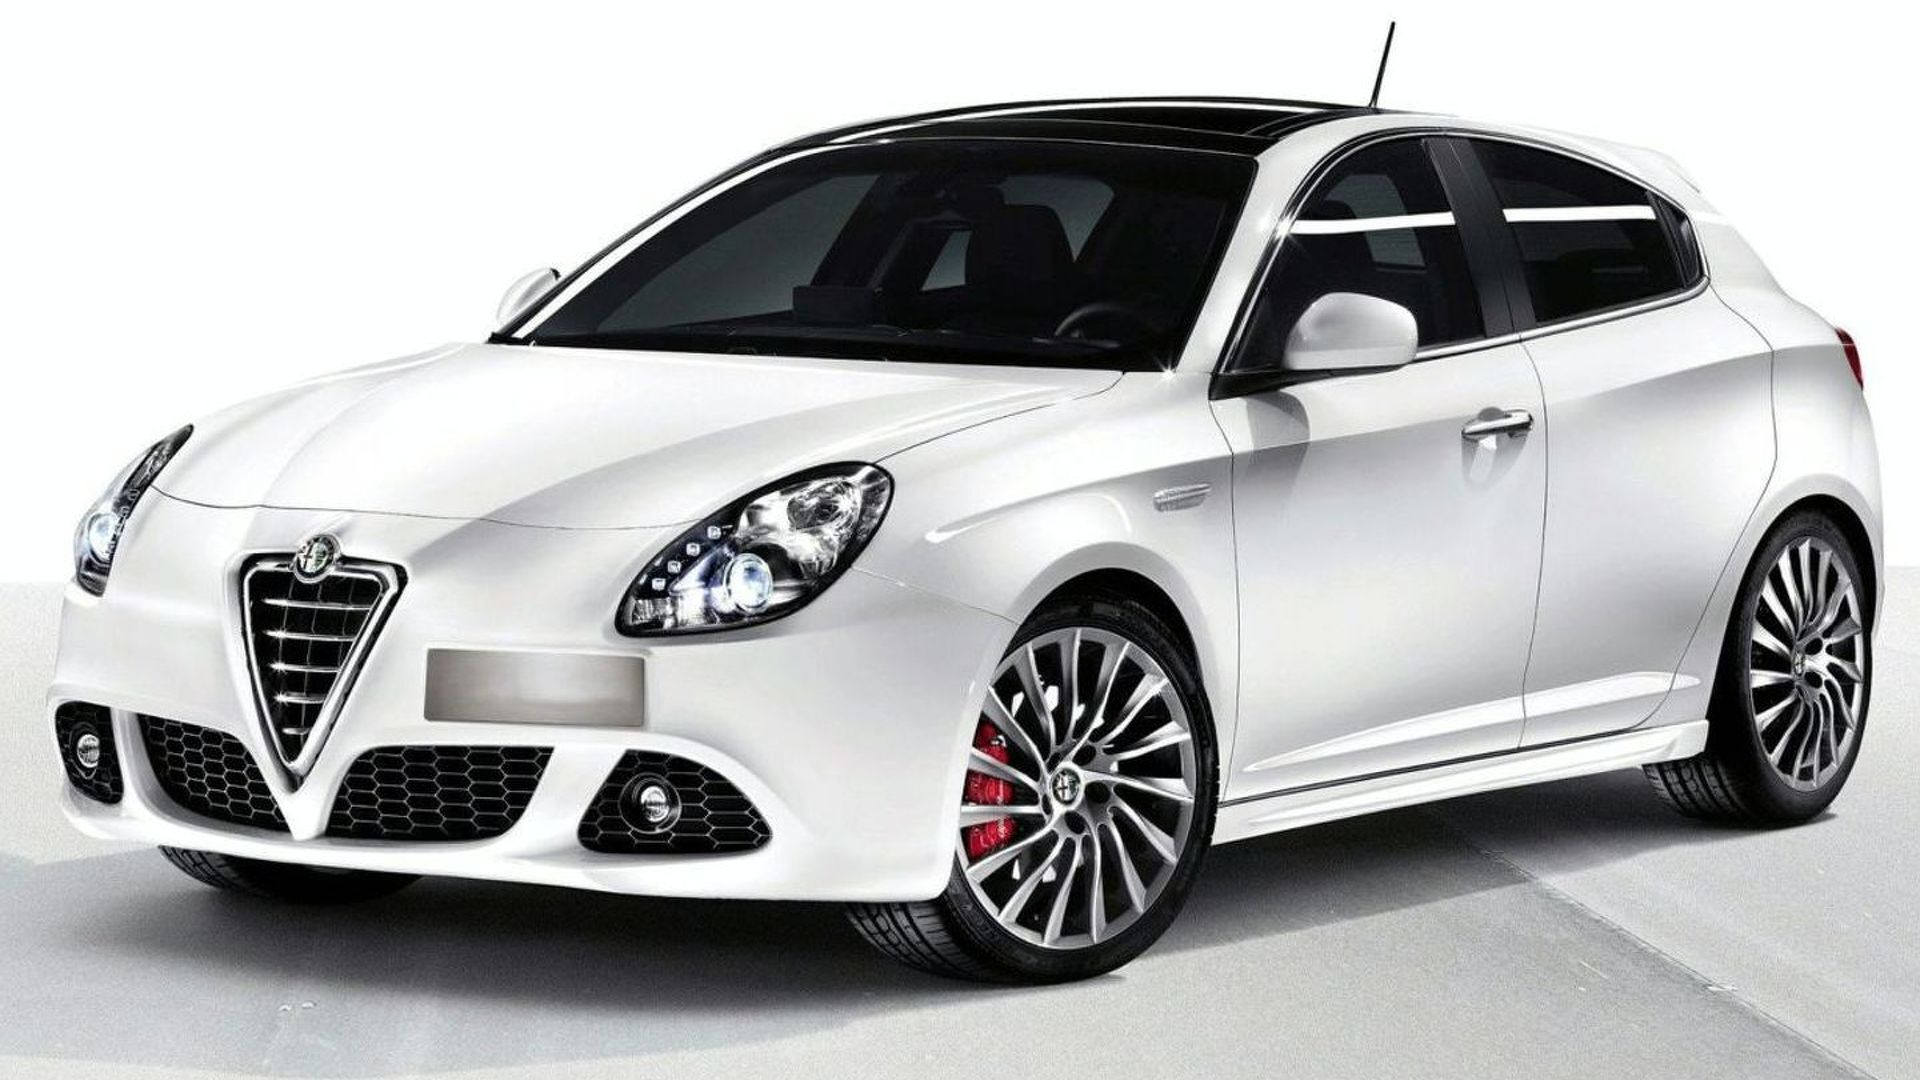 Alfa Romeo Giulietta >> Alfa Romeo Giulietta Revealed